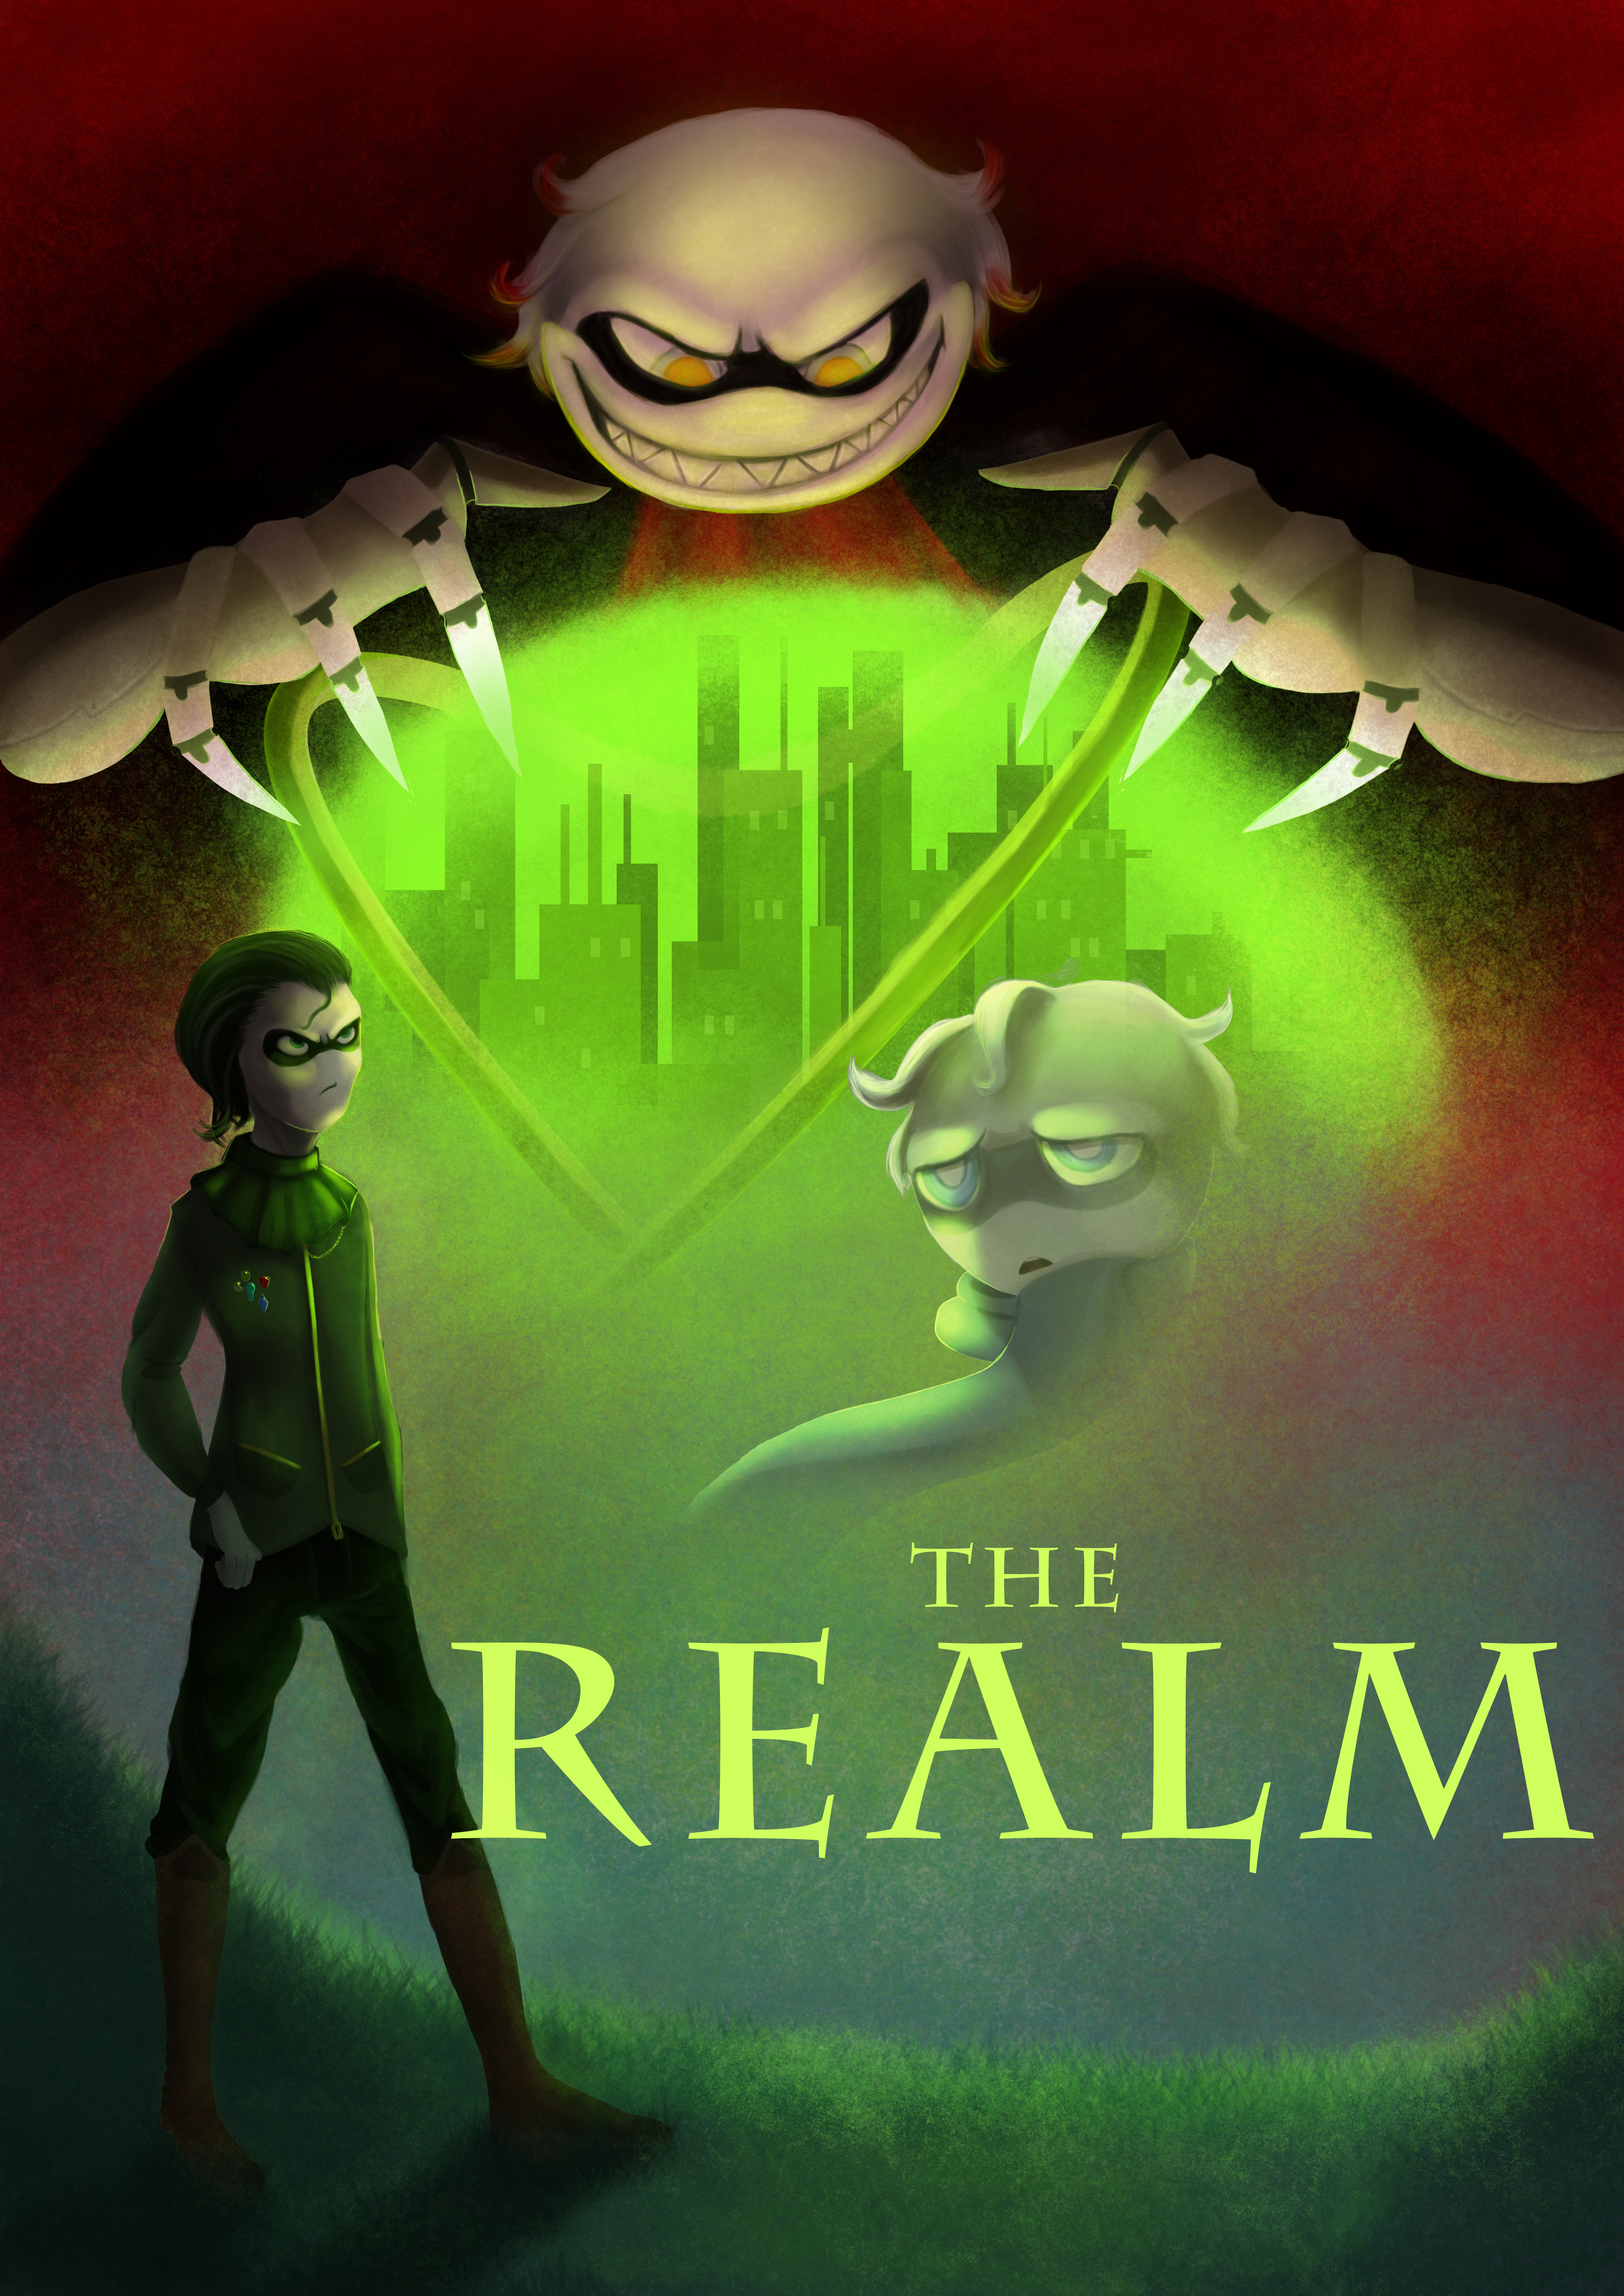 The Realm by JokerGiirl